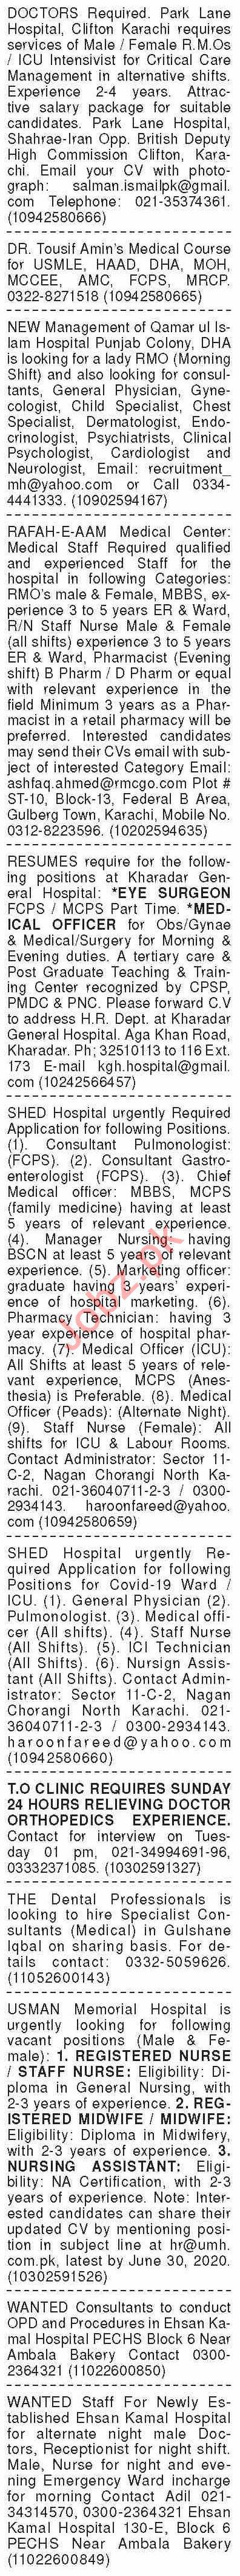 Dawn Sunday Classified Ads 28 June 2020 Paramedical Staff